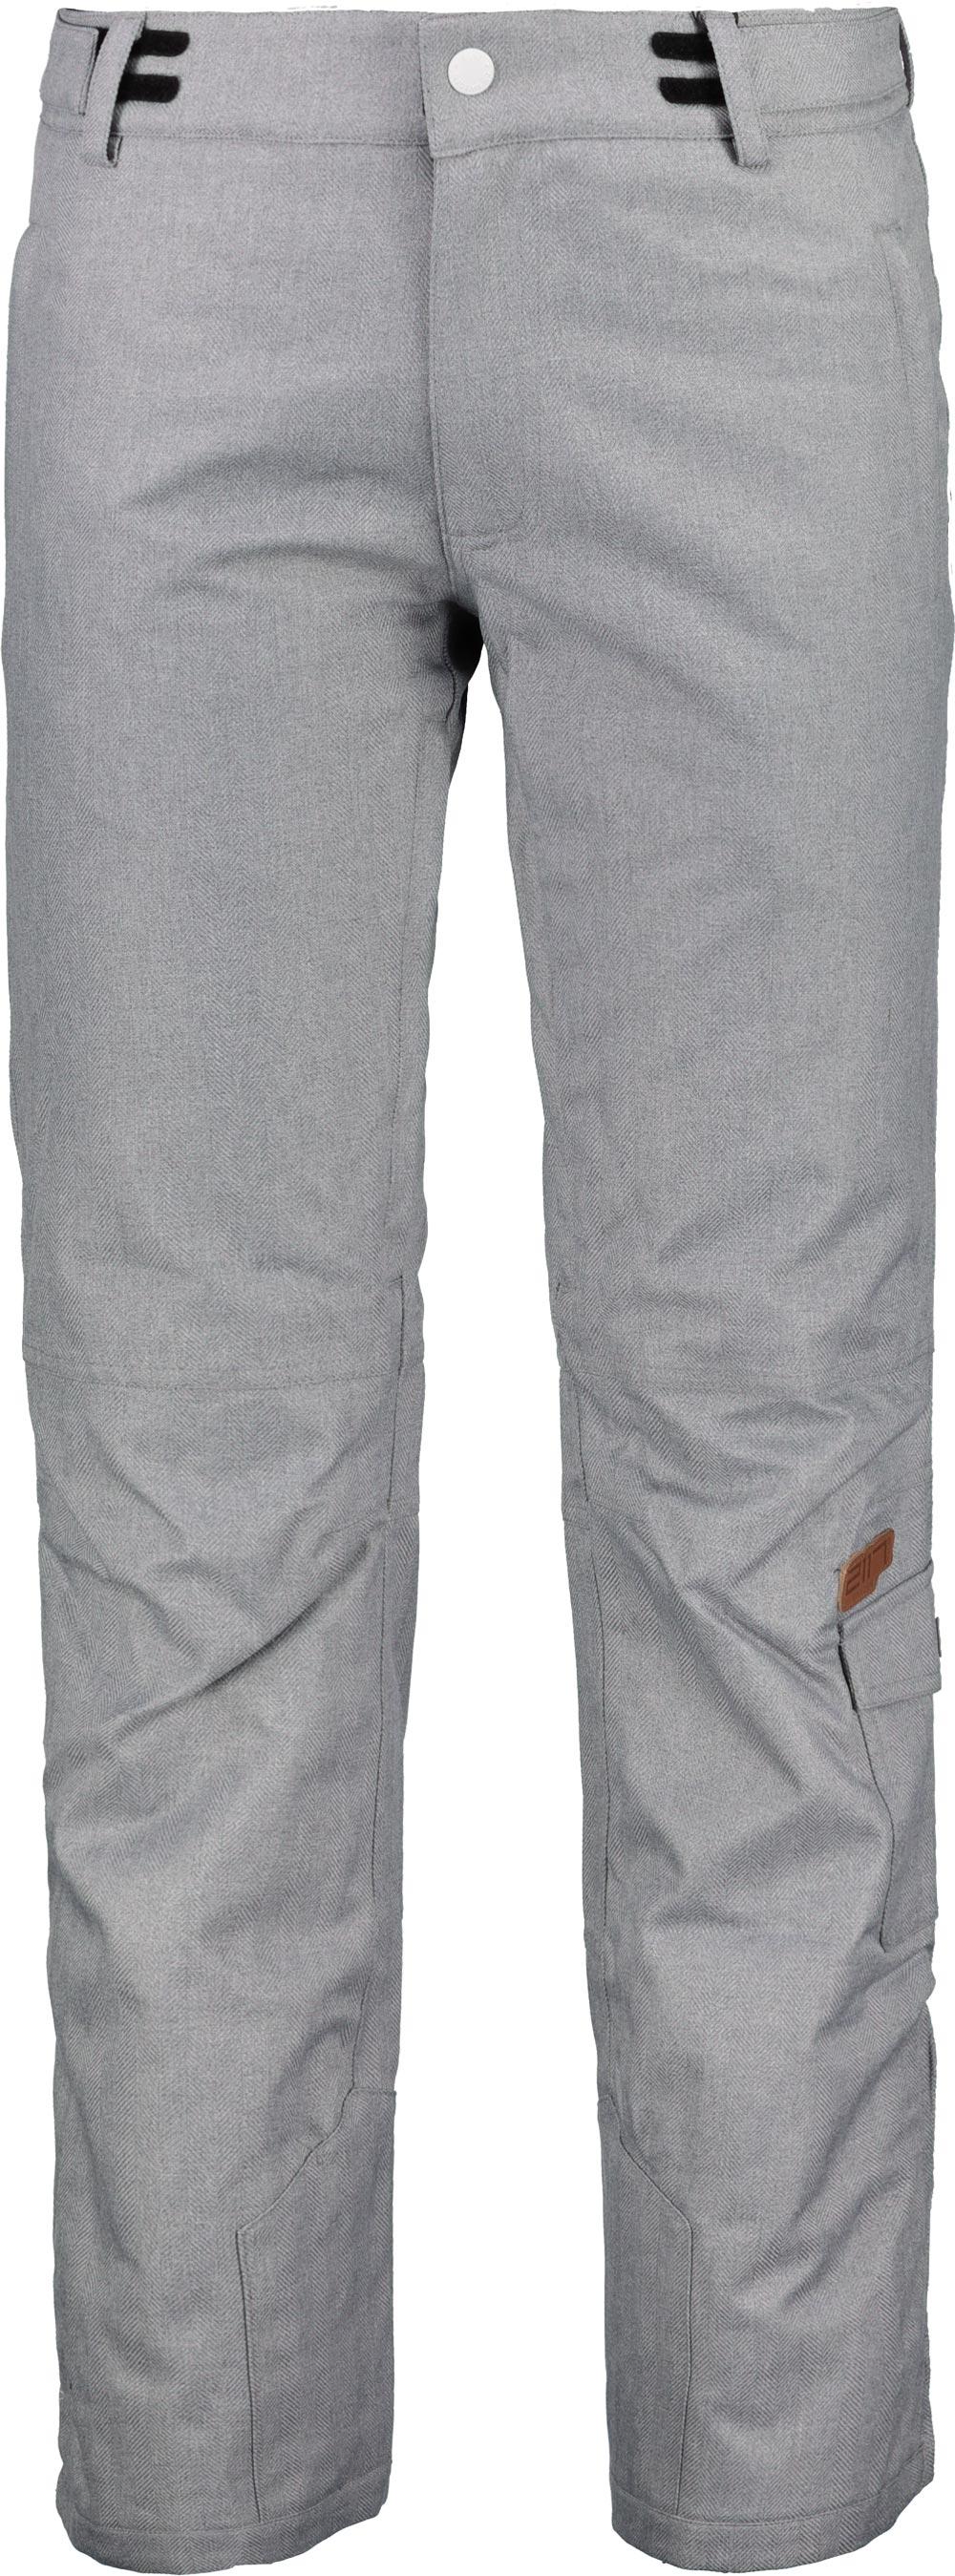 Kalhoty lyžařské pánské 2117 BRAAS